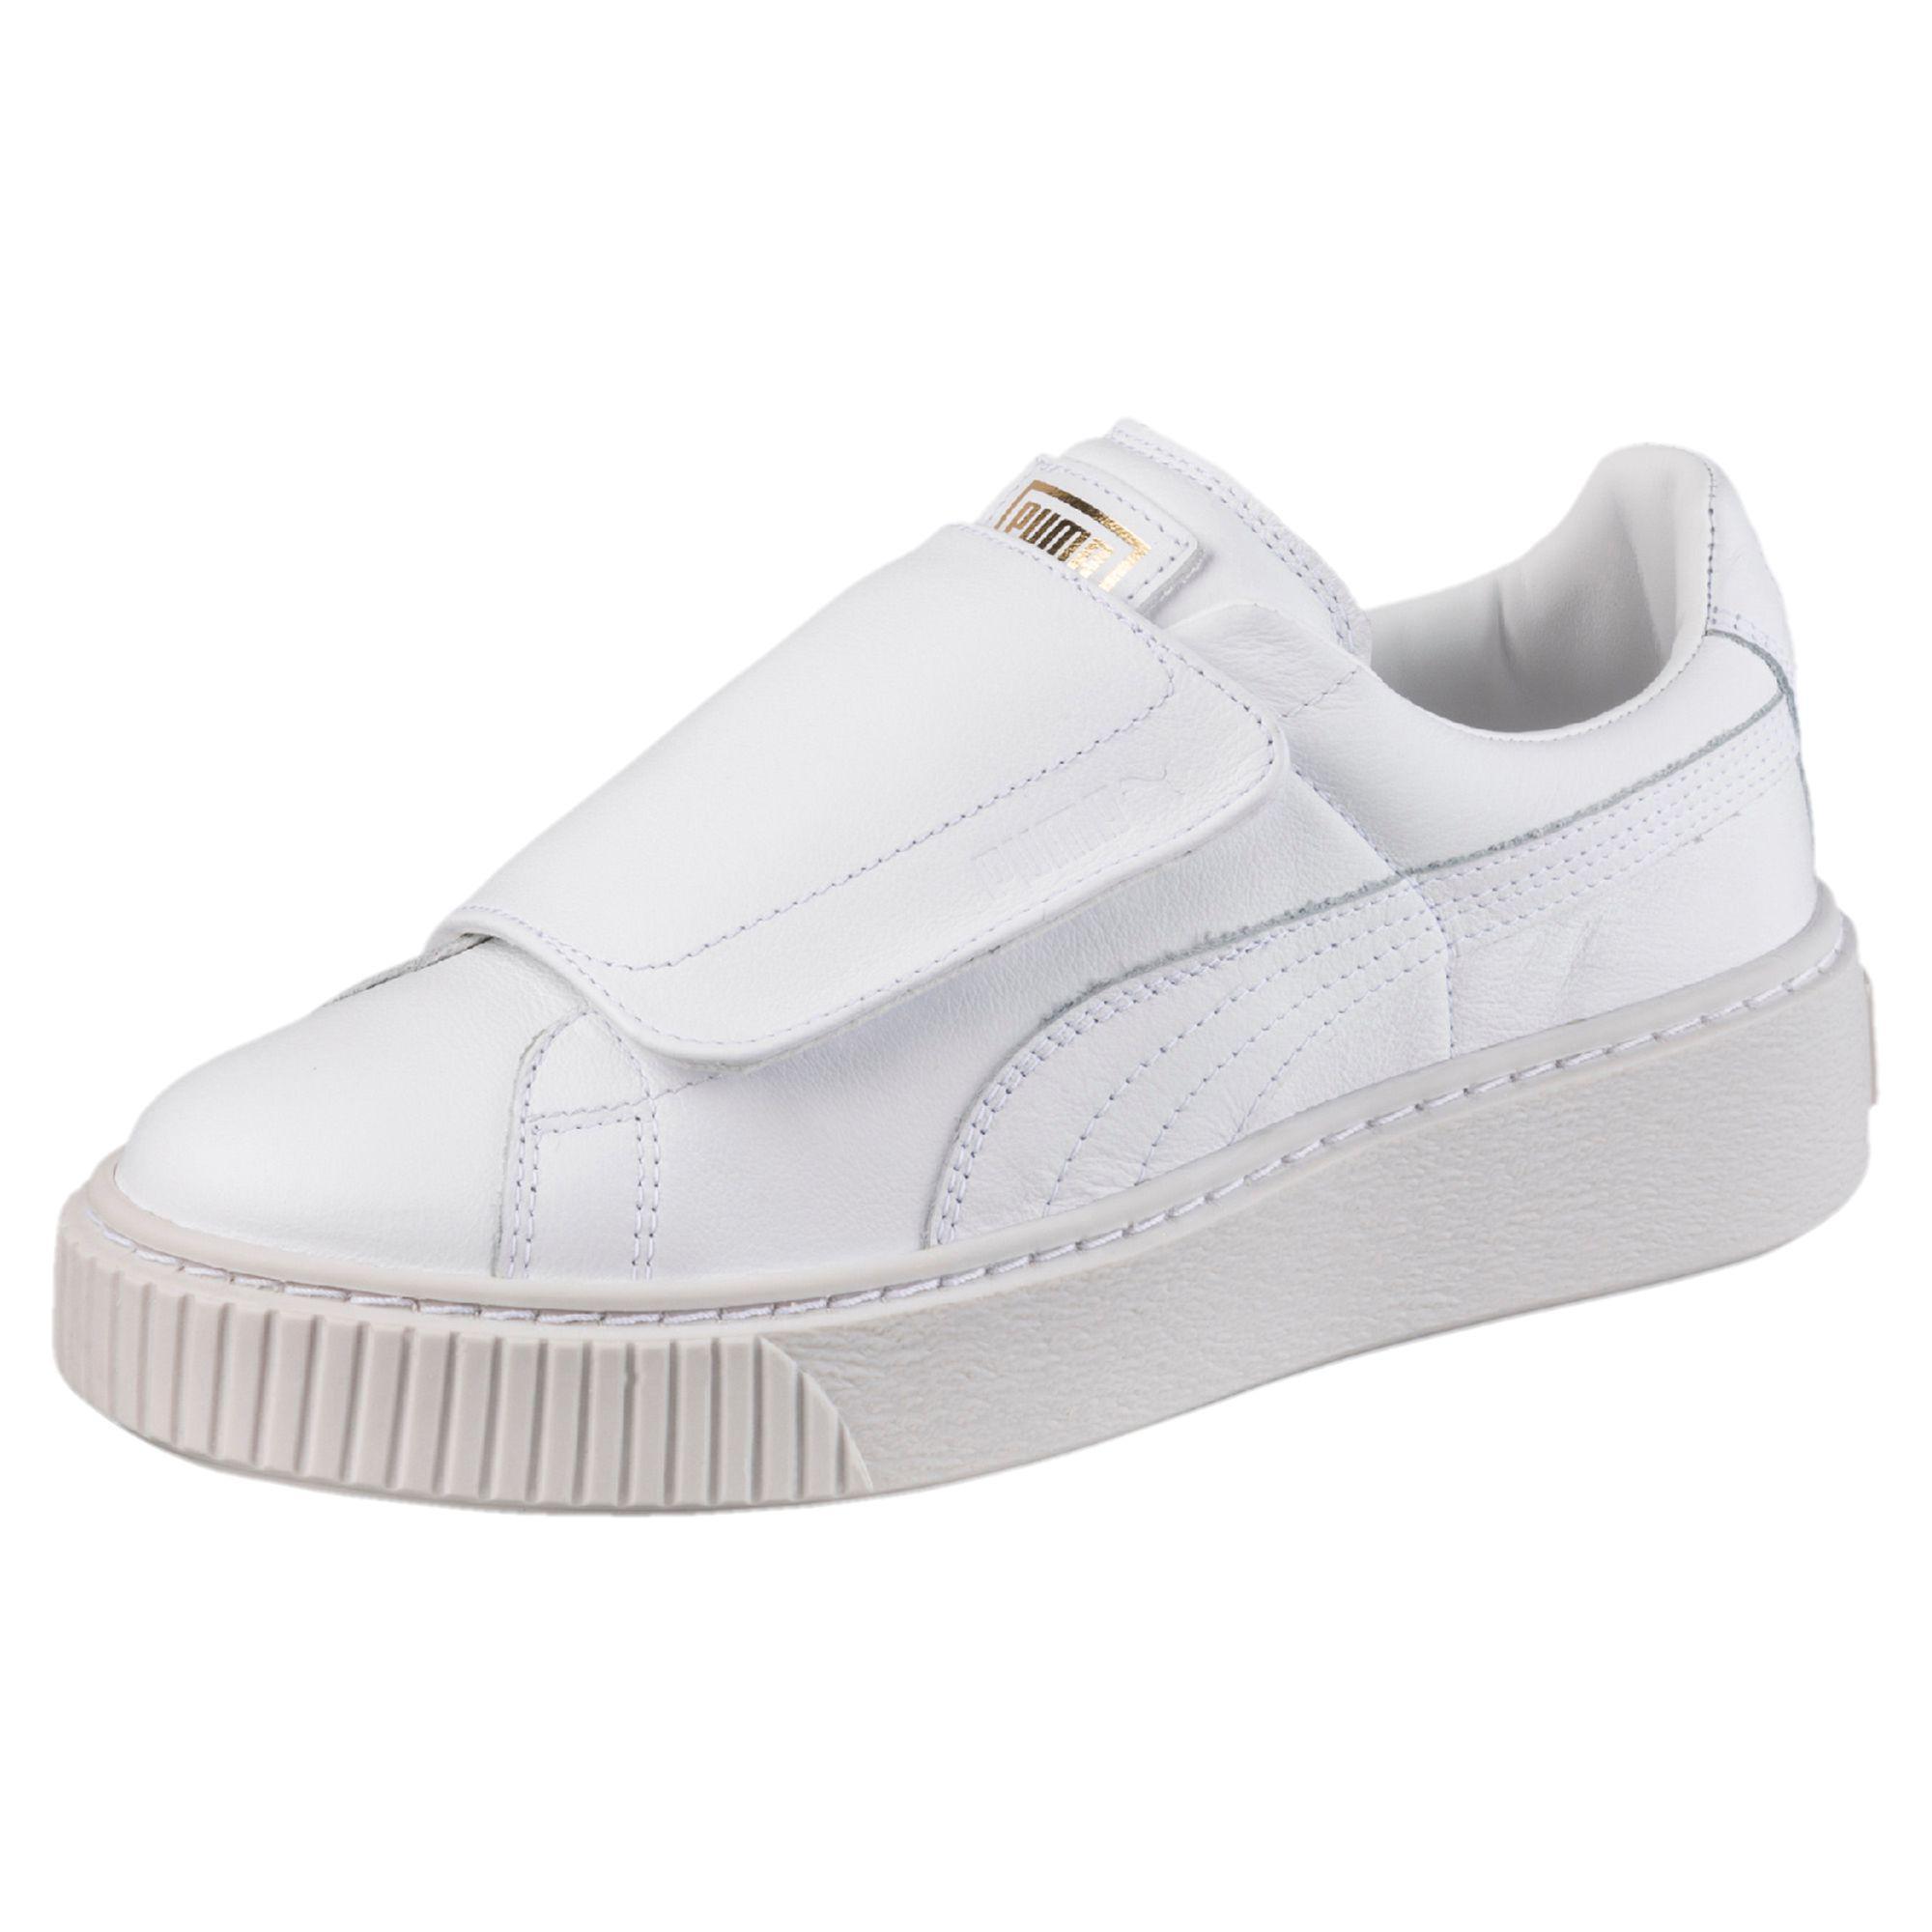 best loved a0d53 f52dc PUMA White Basket Platform Big Strap Women's Sneakers